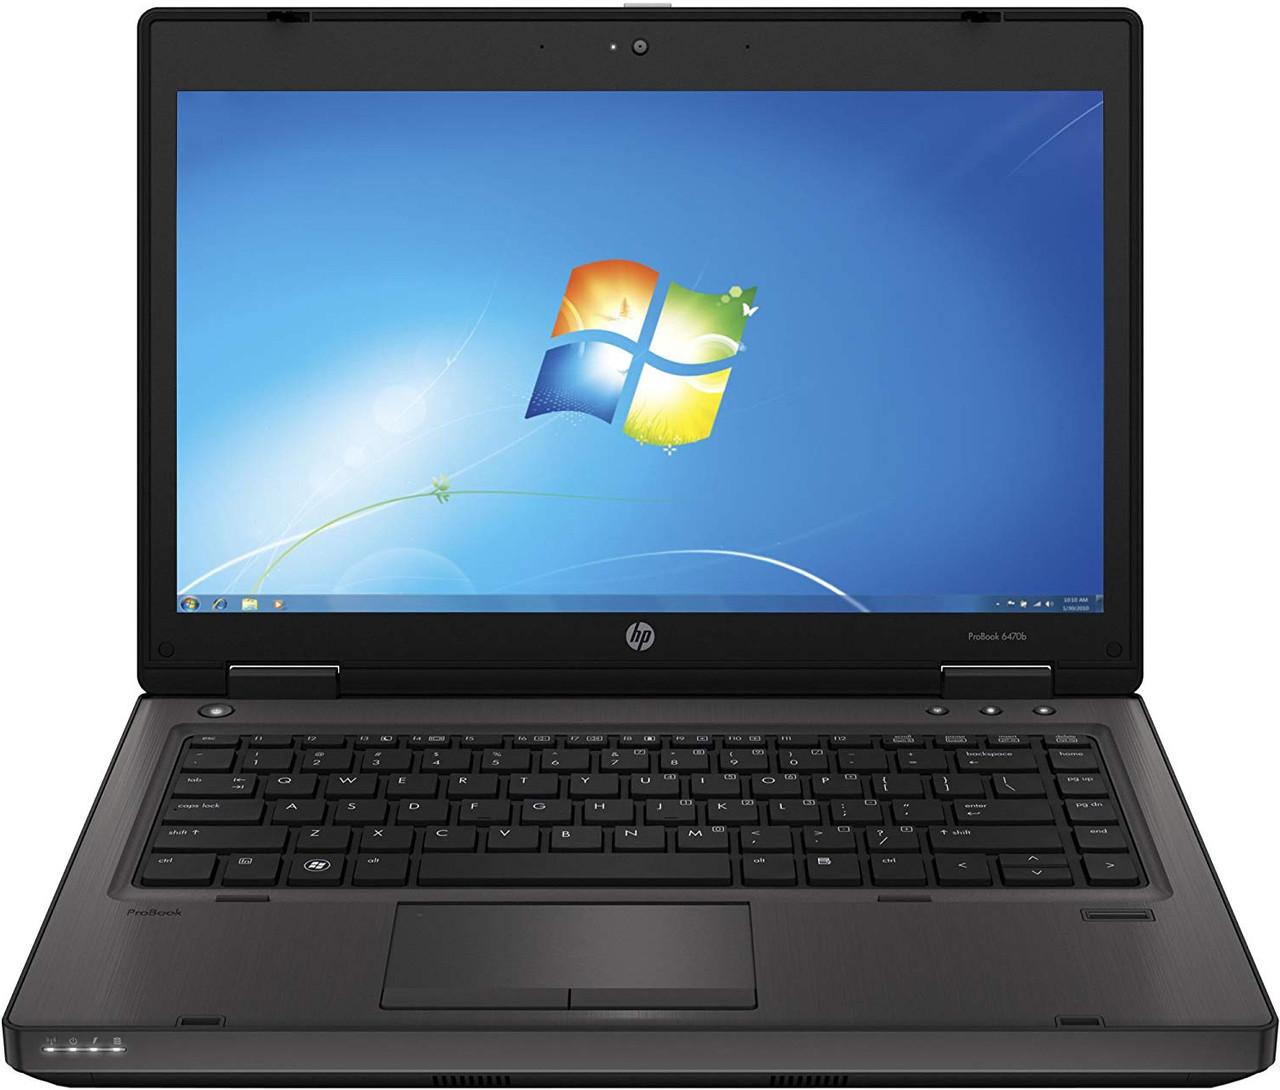 "Ноутбук HP ProBook 6470b (i5-3210M/4/500) - Class A ""Б/У"""